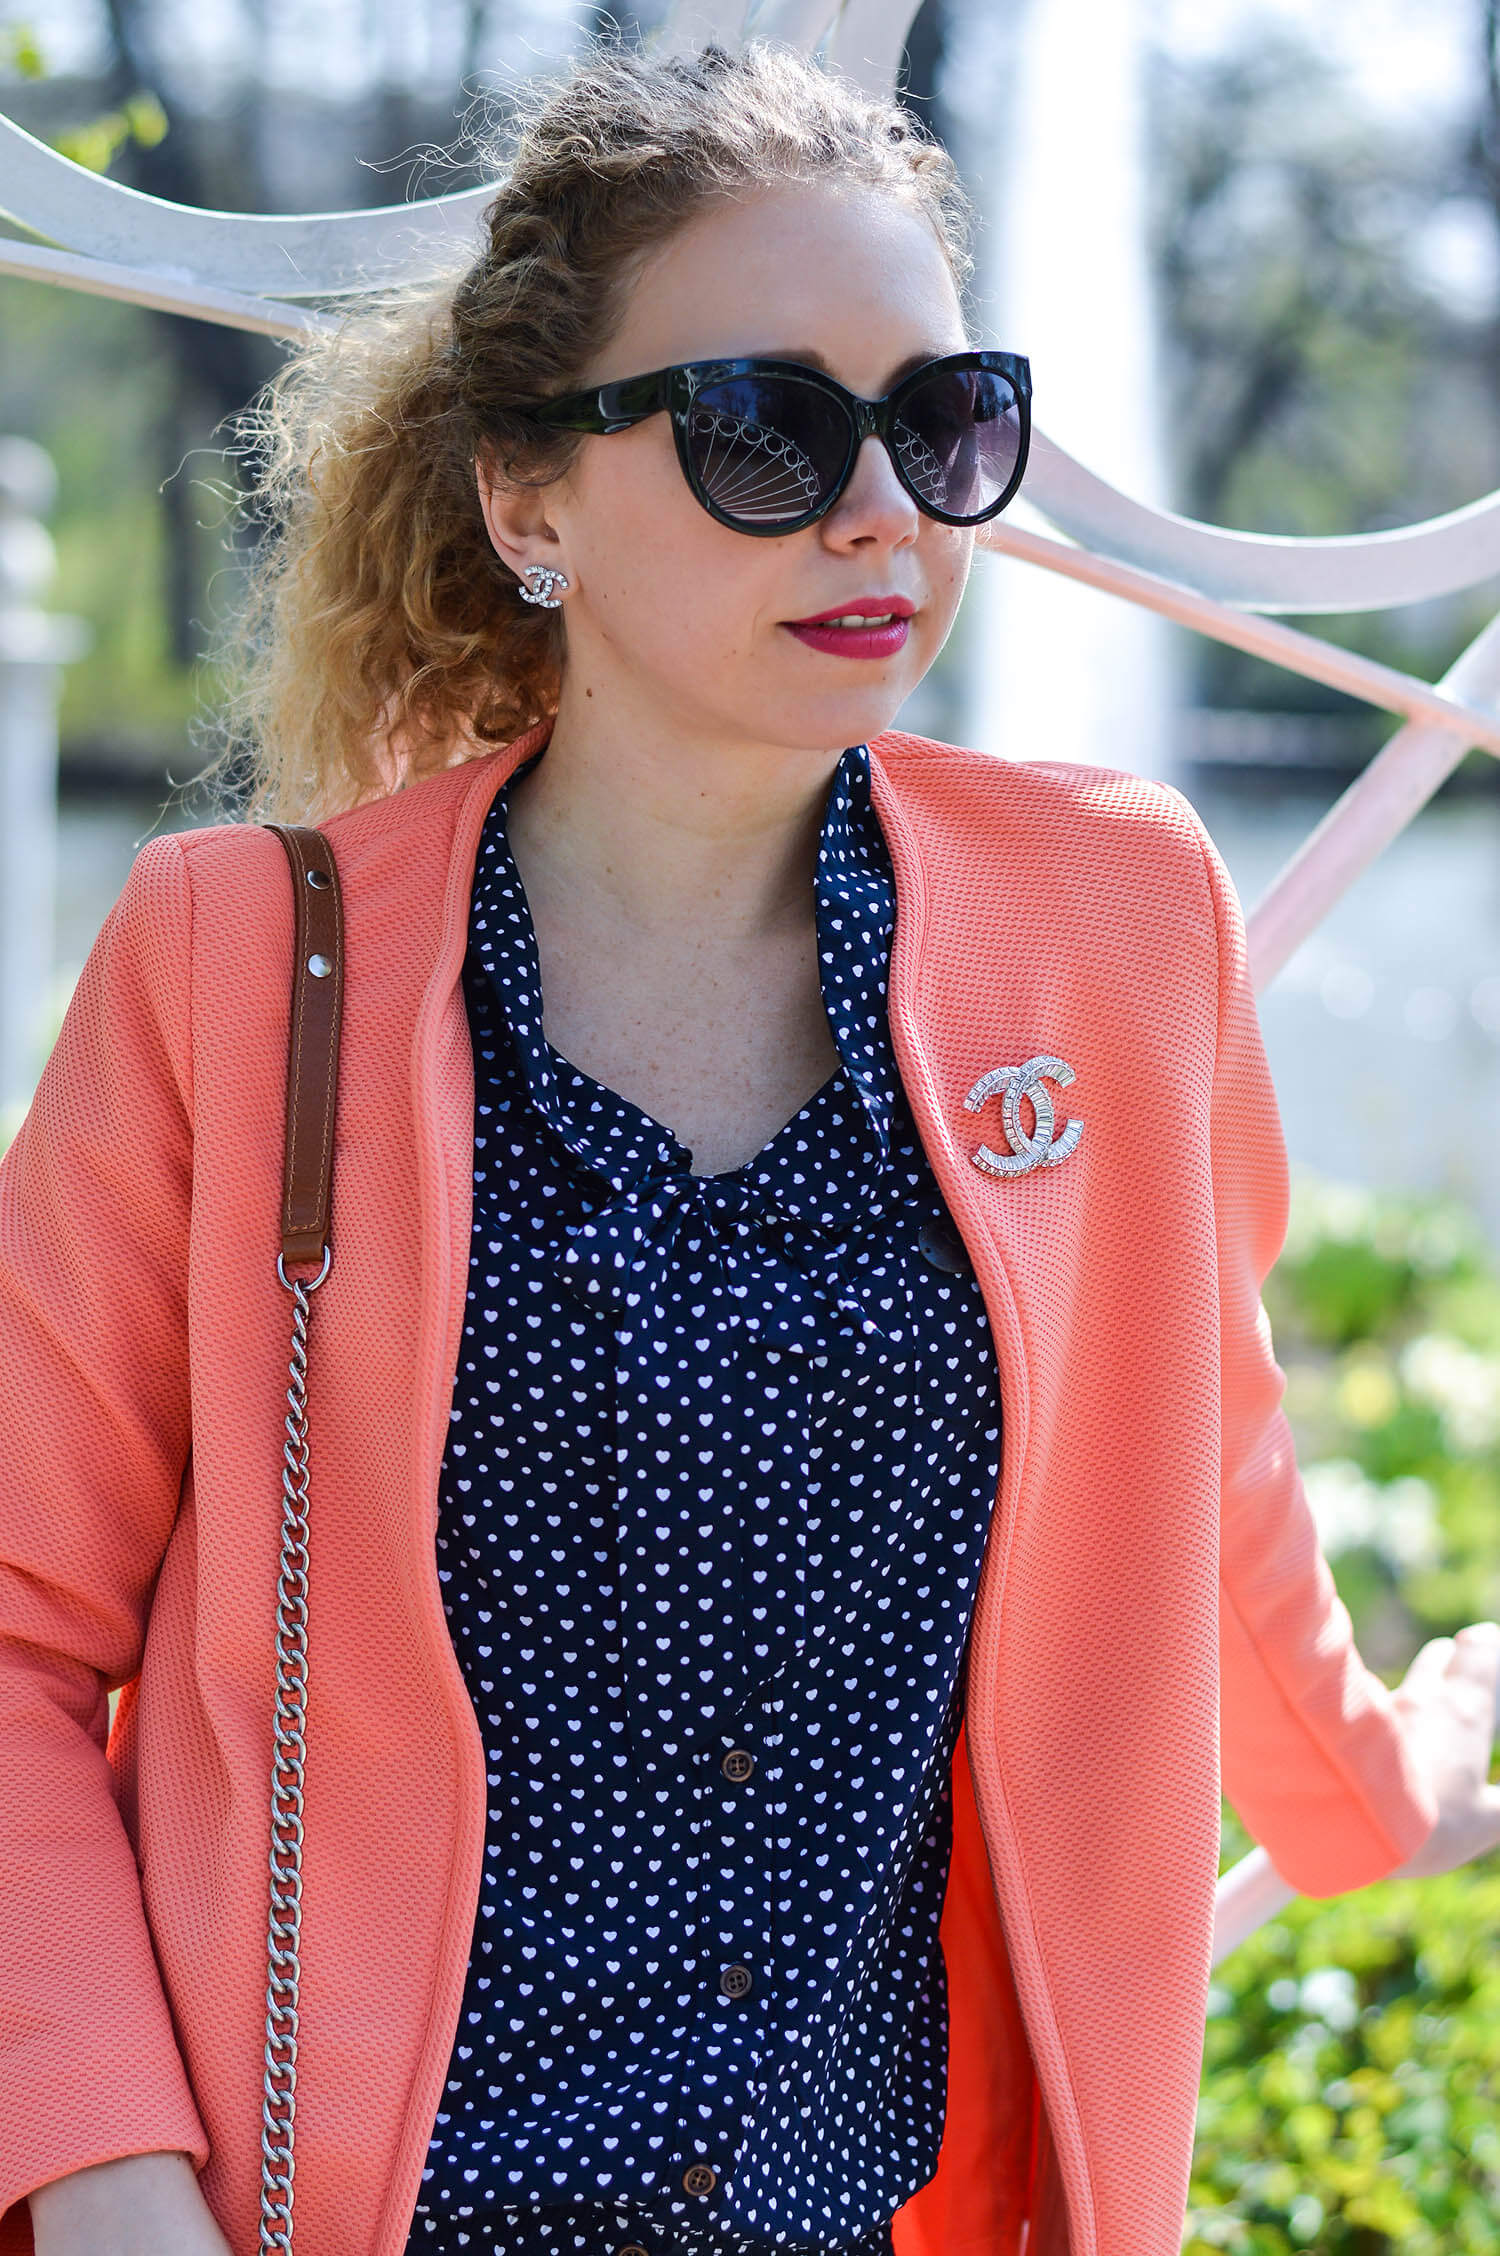 Marionette-fashionblog-nrw-Outfit-streetstyle-Coral-Coat-Naketano-Blouse-Pink-Zara-Satin-Pumps